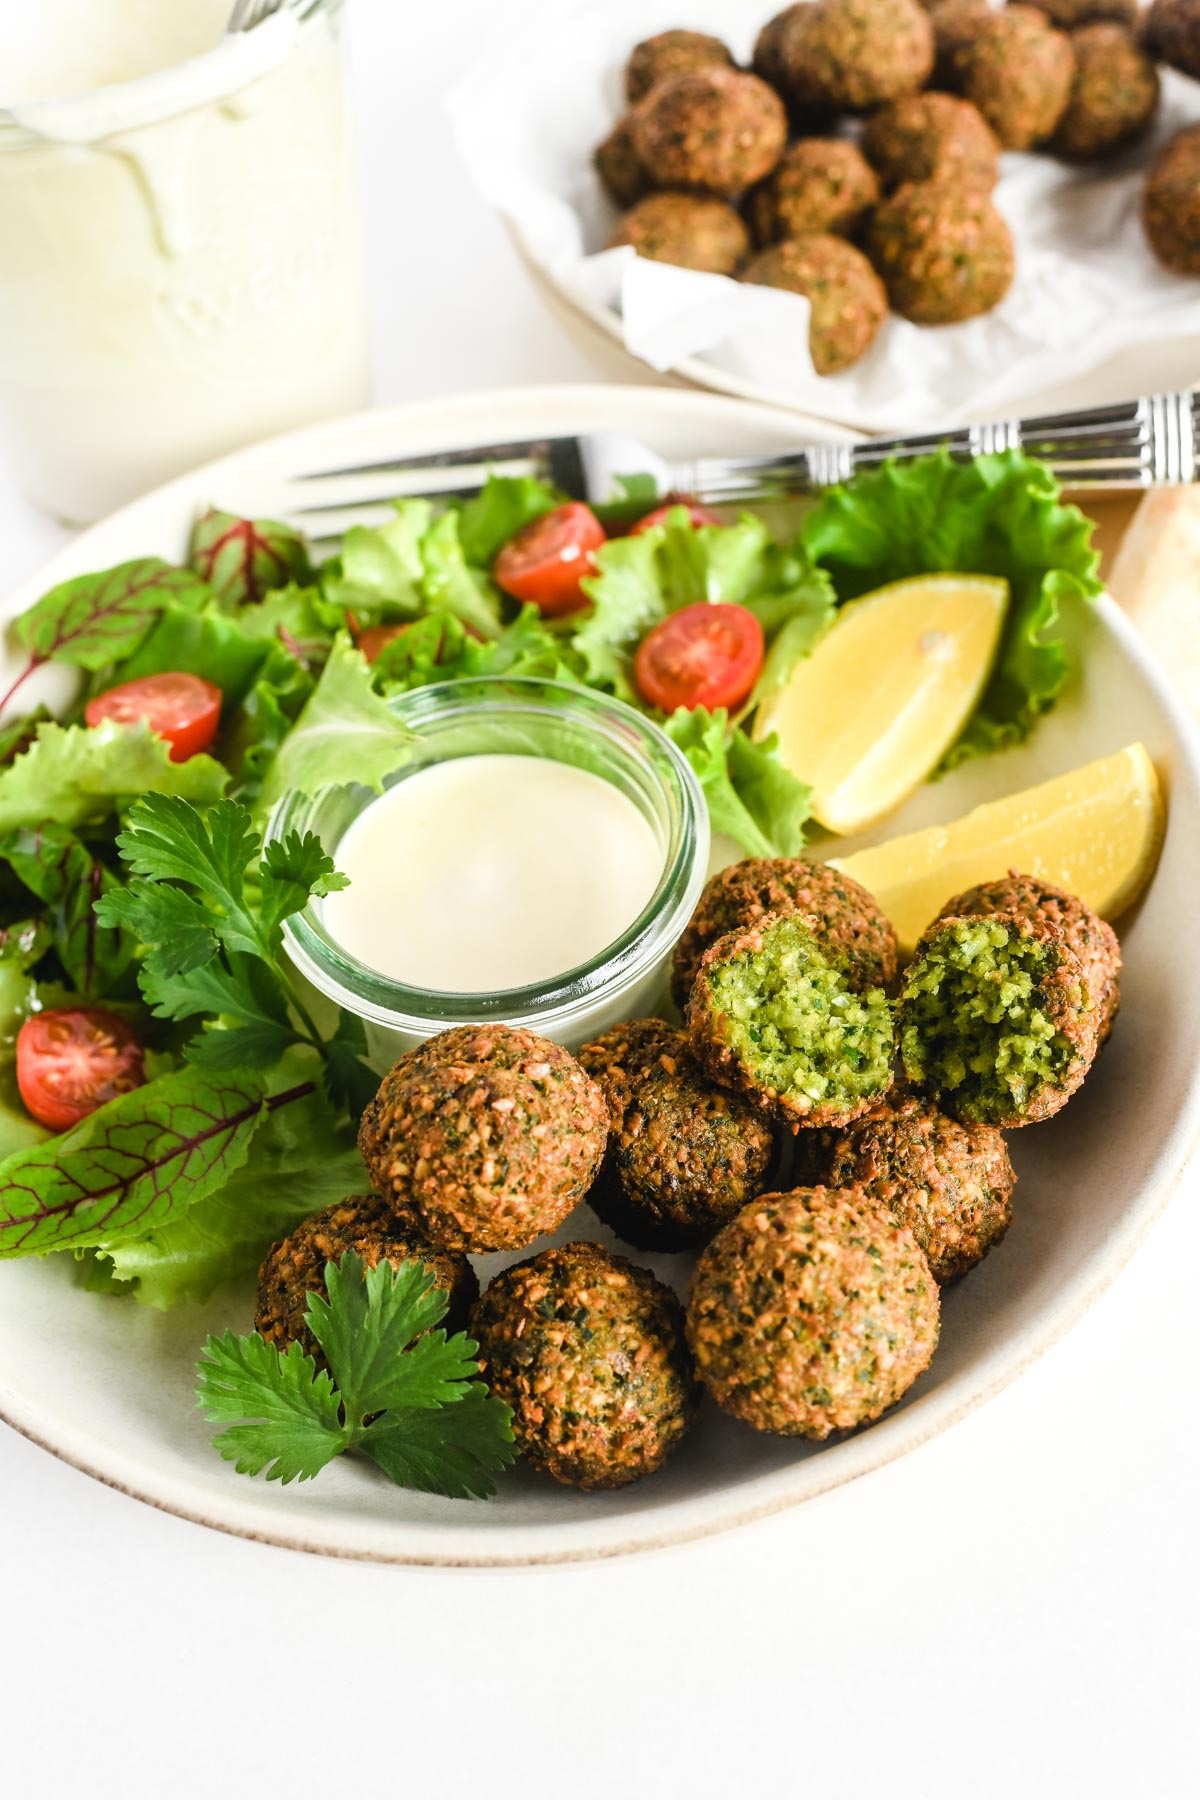 homemade falafel with salad and lemon